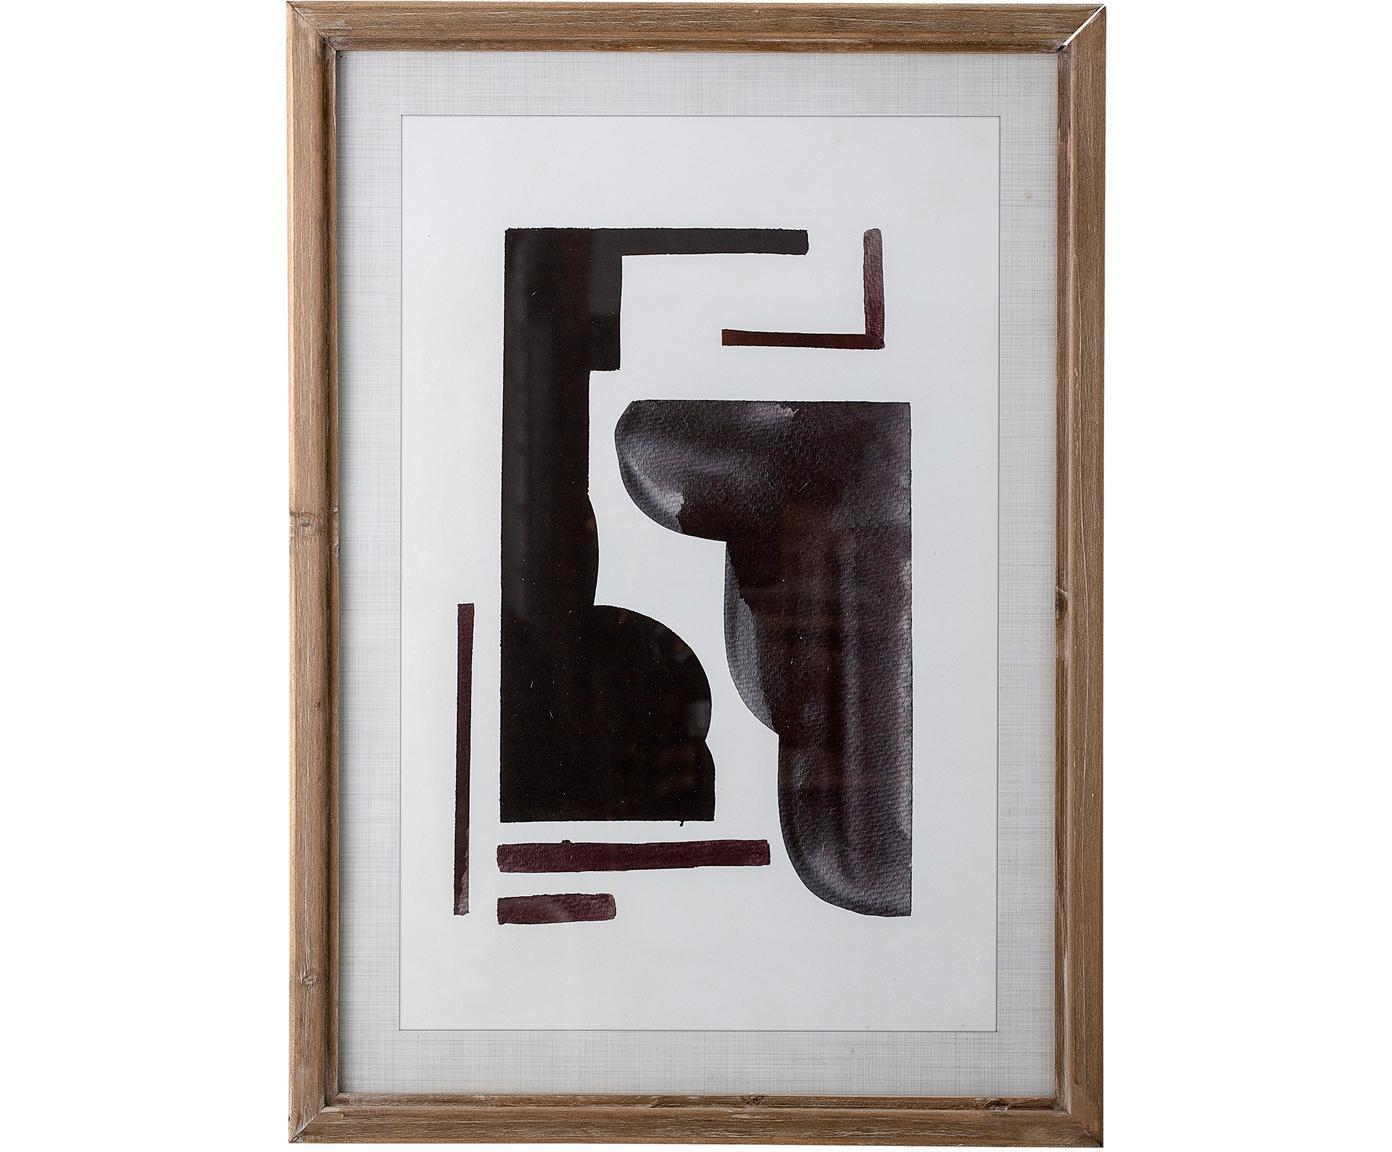 Impresión digital enmarcada Hannelore, Madera de abeto, An 50 x Al 70 cm